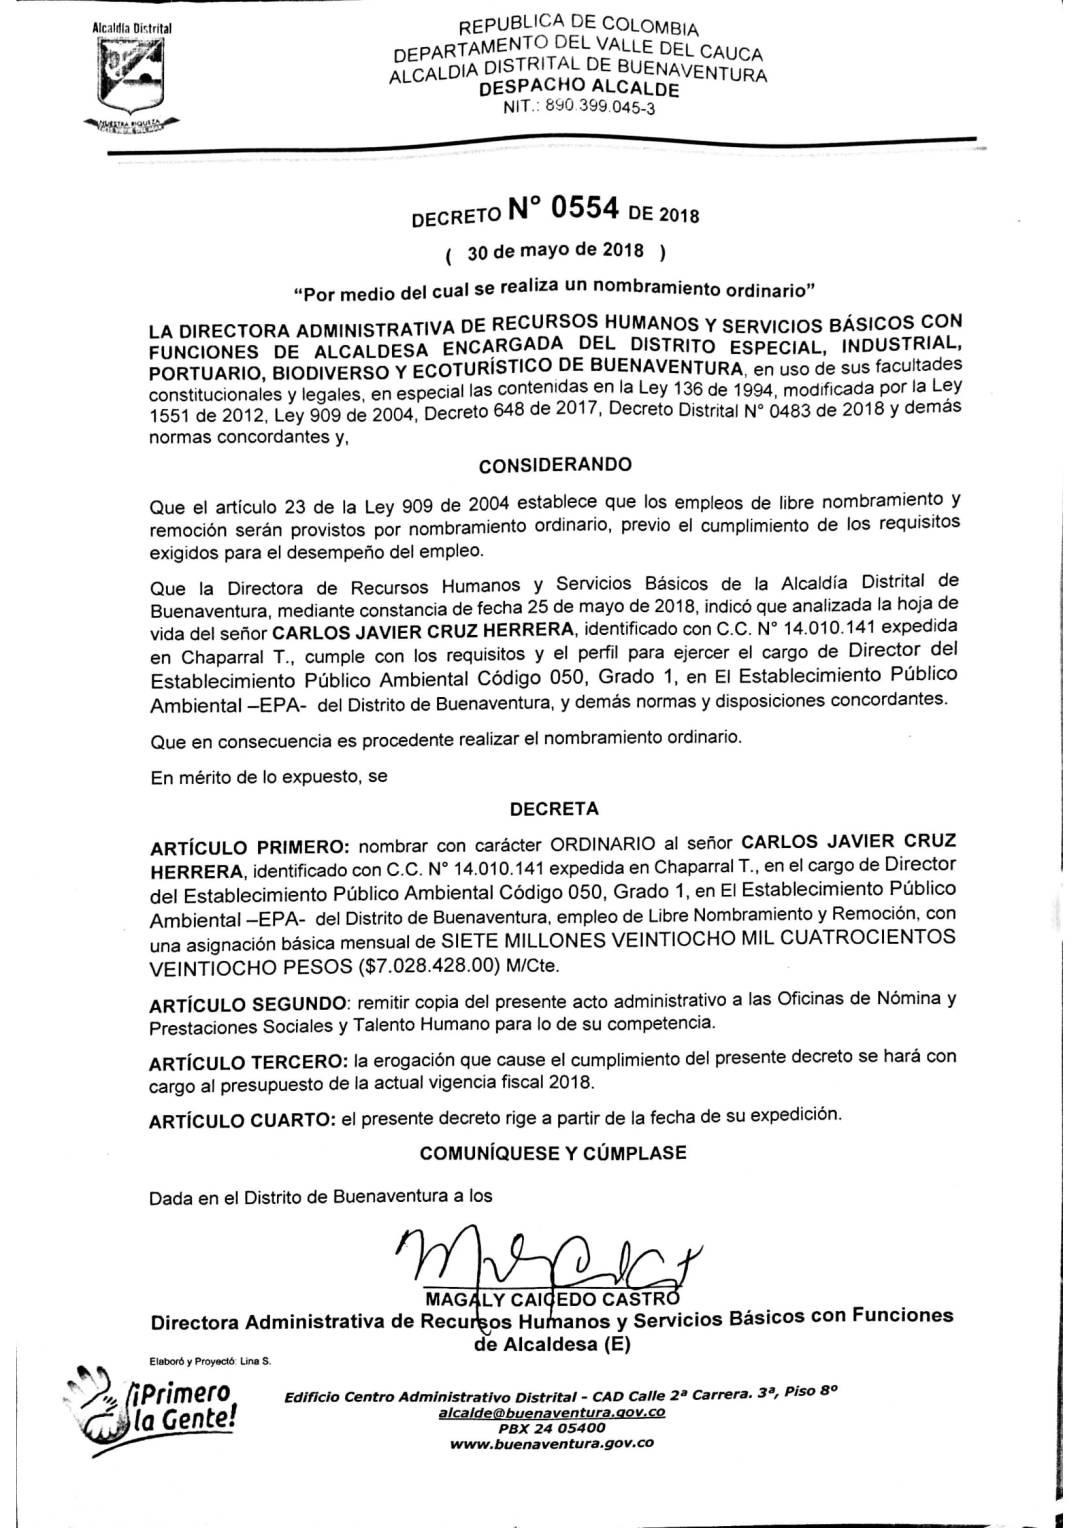 Decreto nombramiento-1